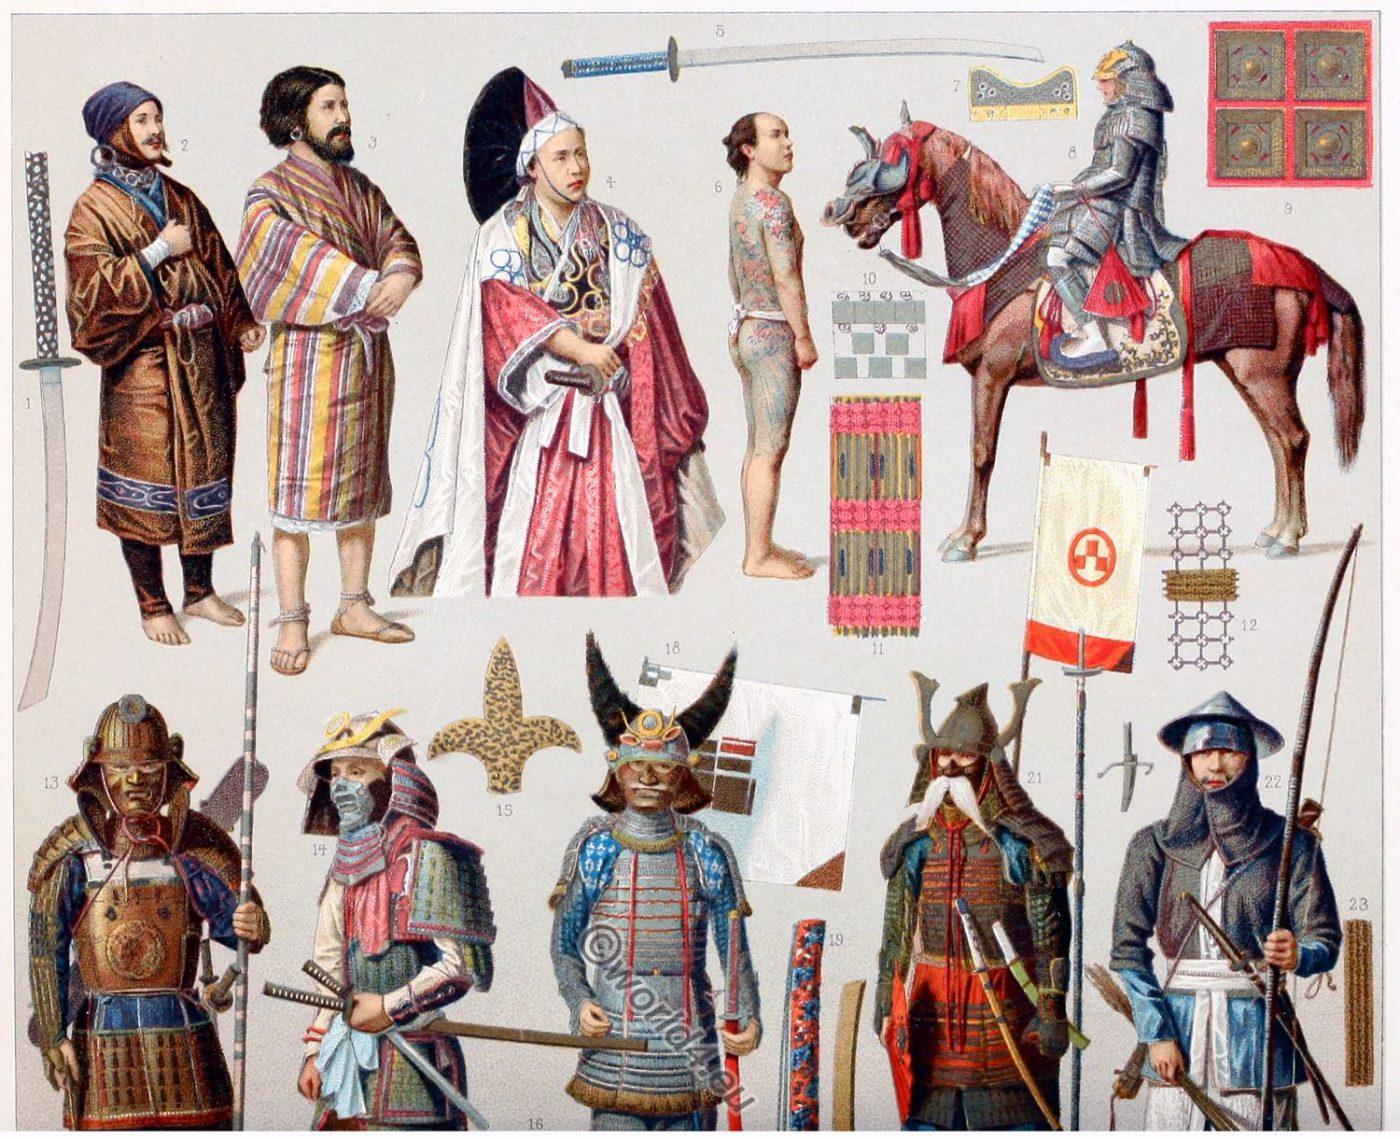 Japanese, Armor, court dress, nobility, Ainus, Daimio